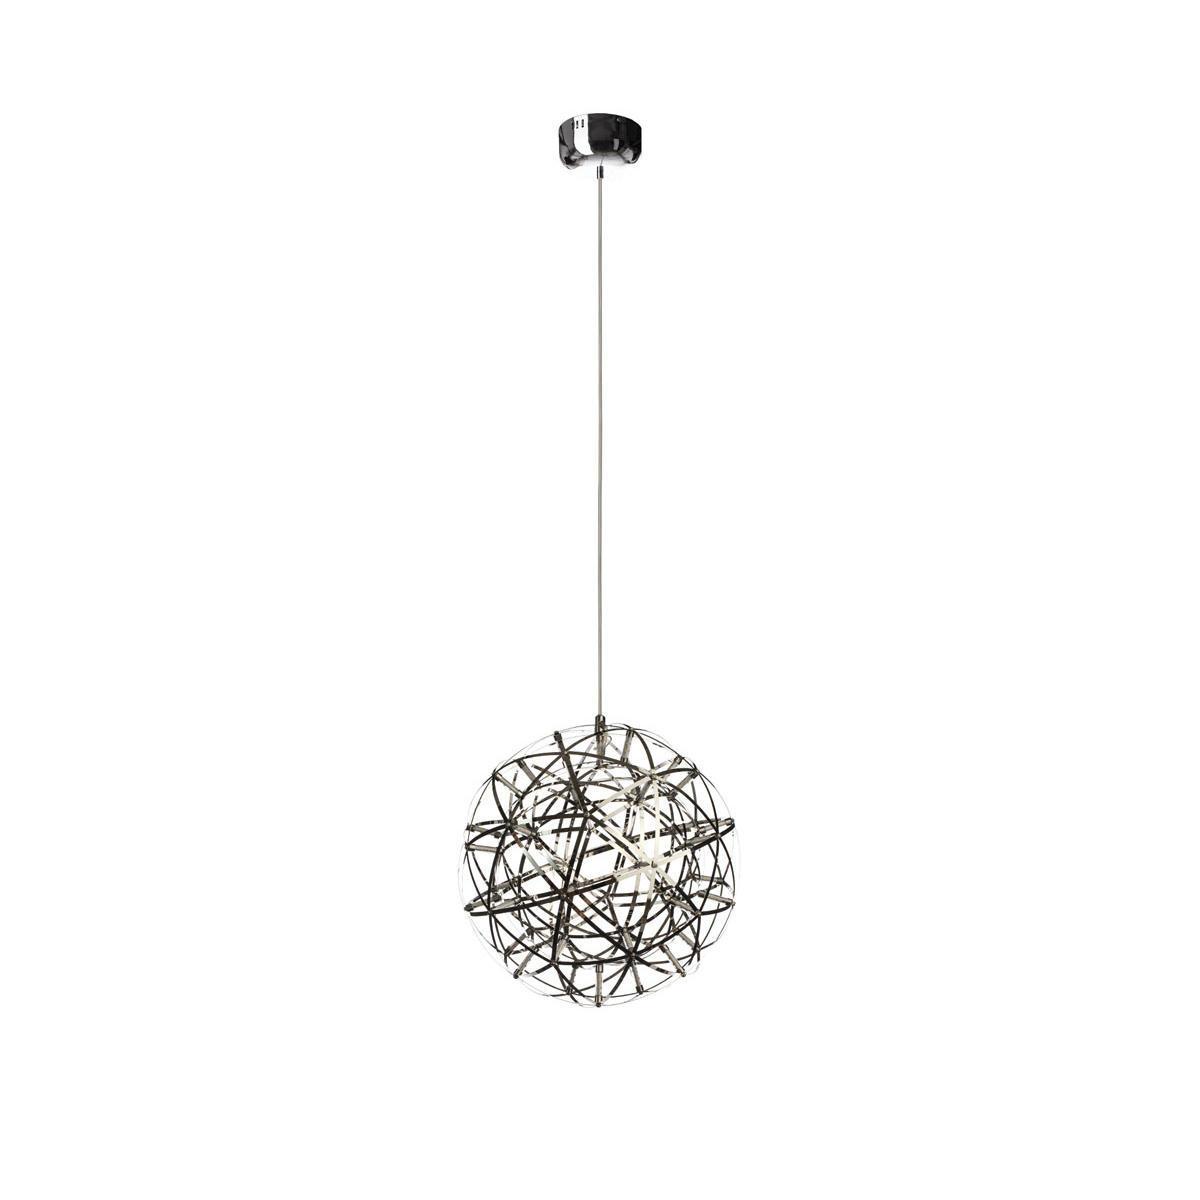 Подвесная светодиодная люстра Loft It Moooi Raimond 1898/4, LED 16,8W, хром, металл - фото 1